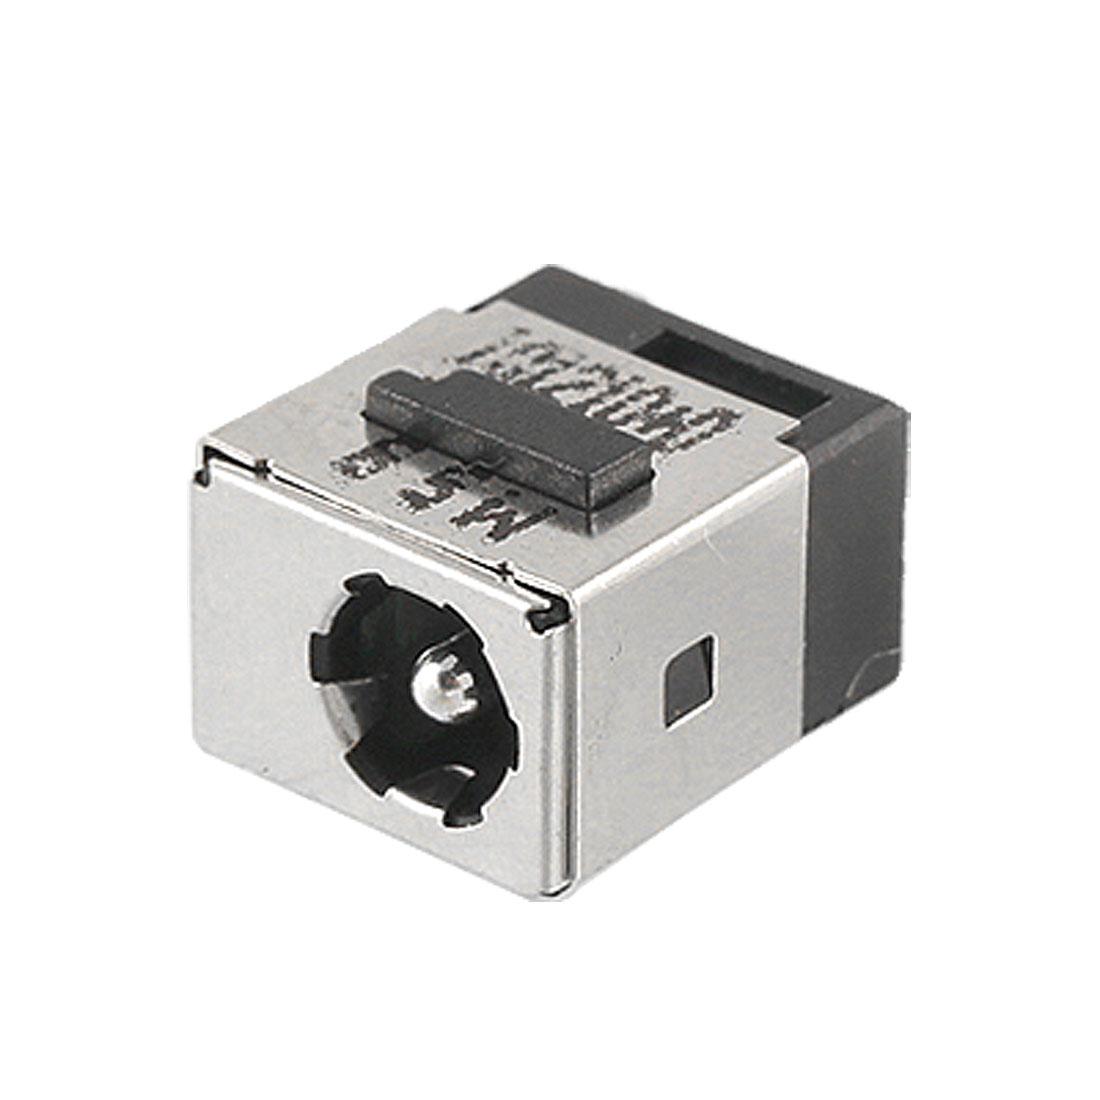 PJ027 1.65mm 65W DC Power Jack for HP Pavilion DV8000 DV5000